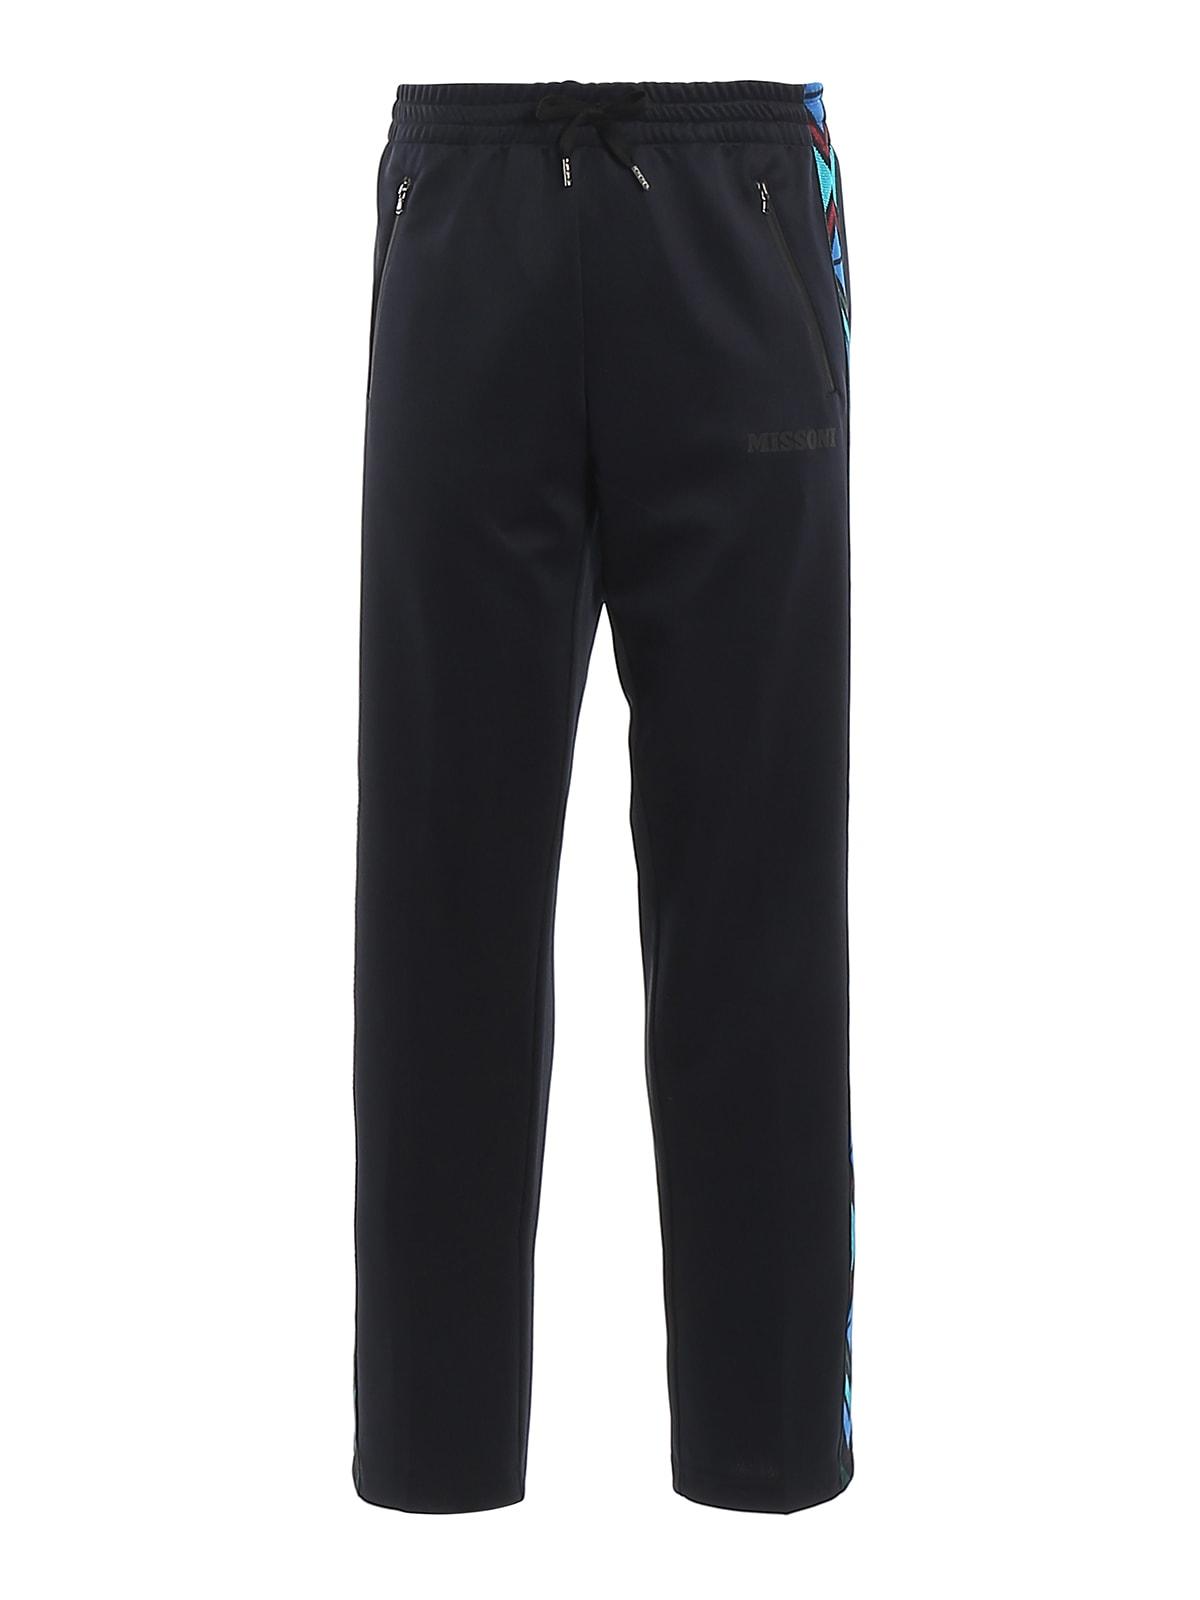 Missoni Jumpsuit Pants